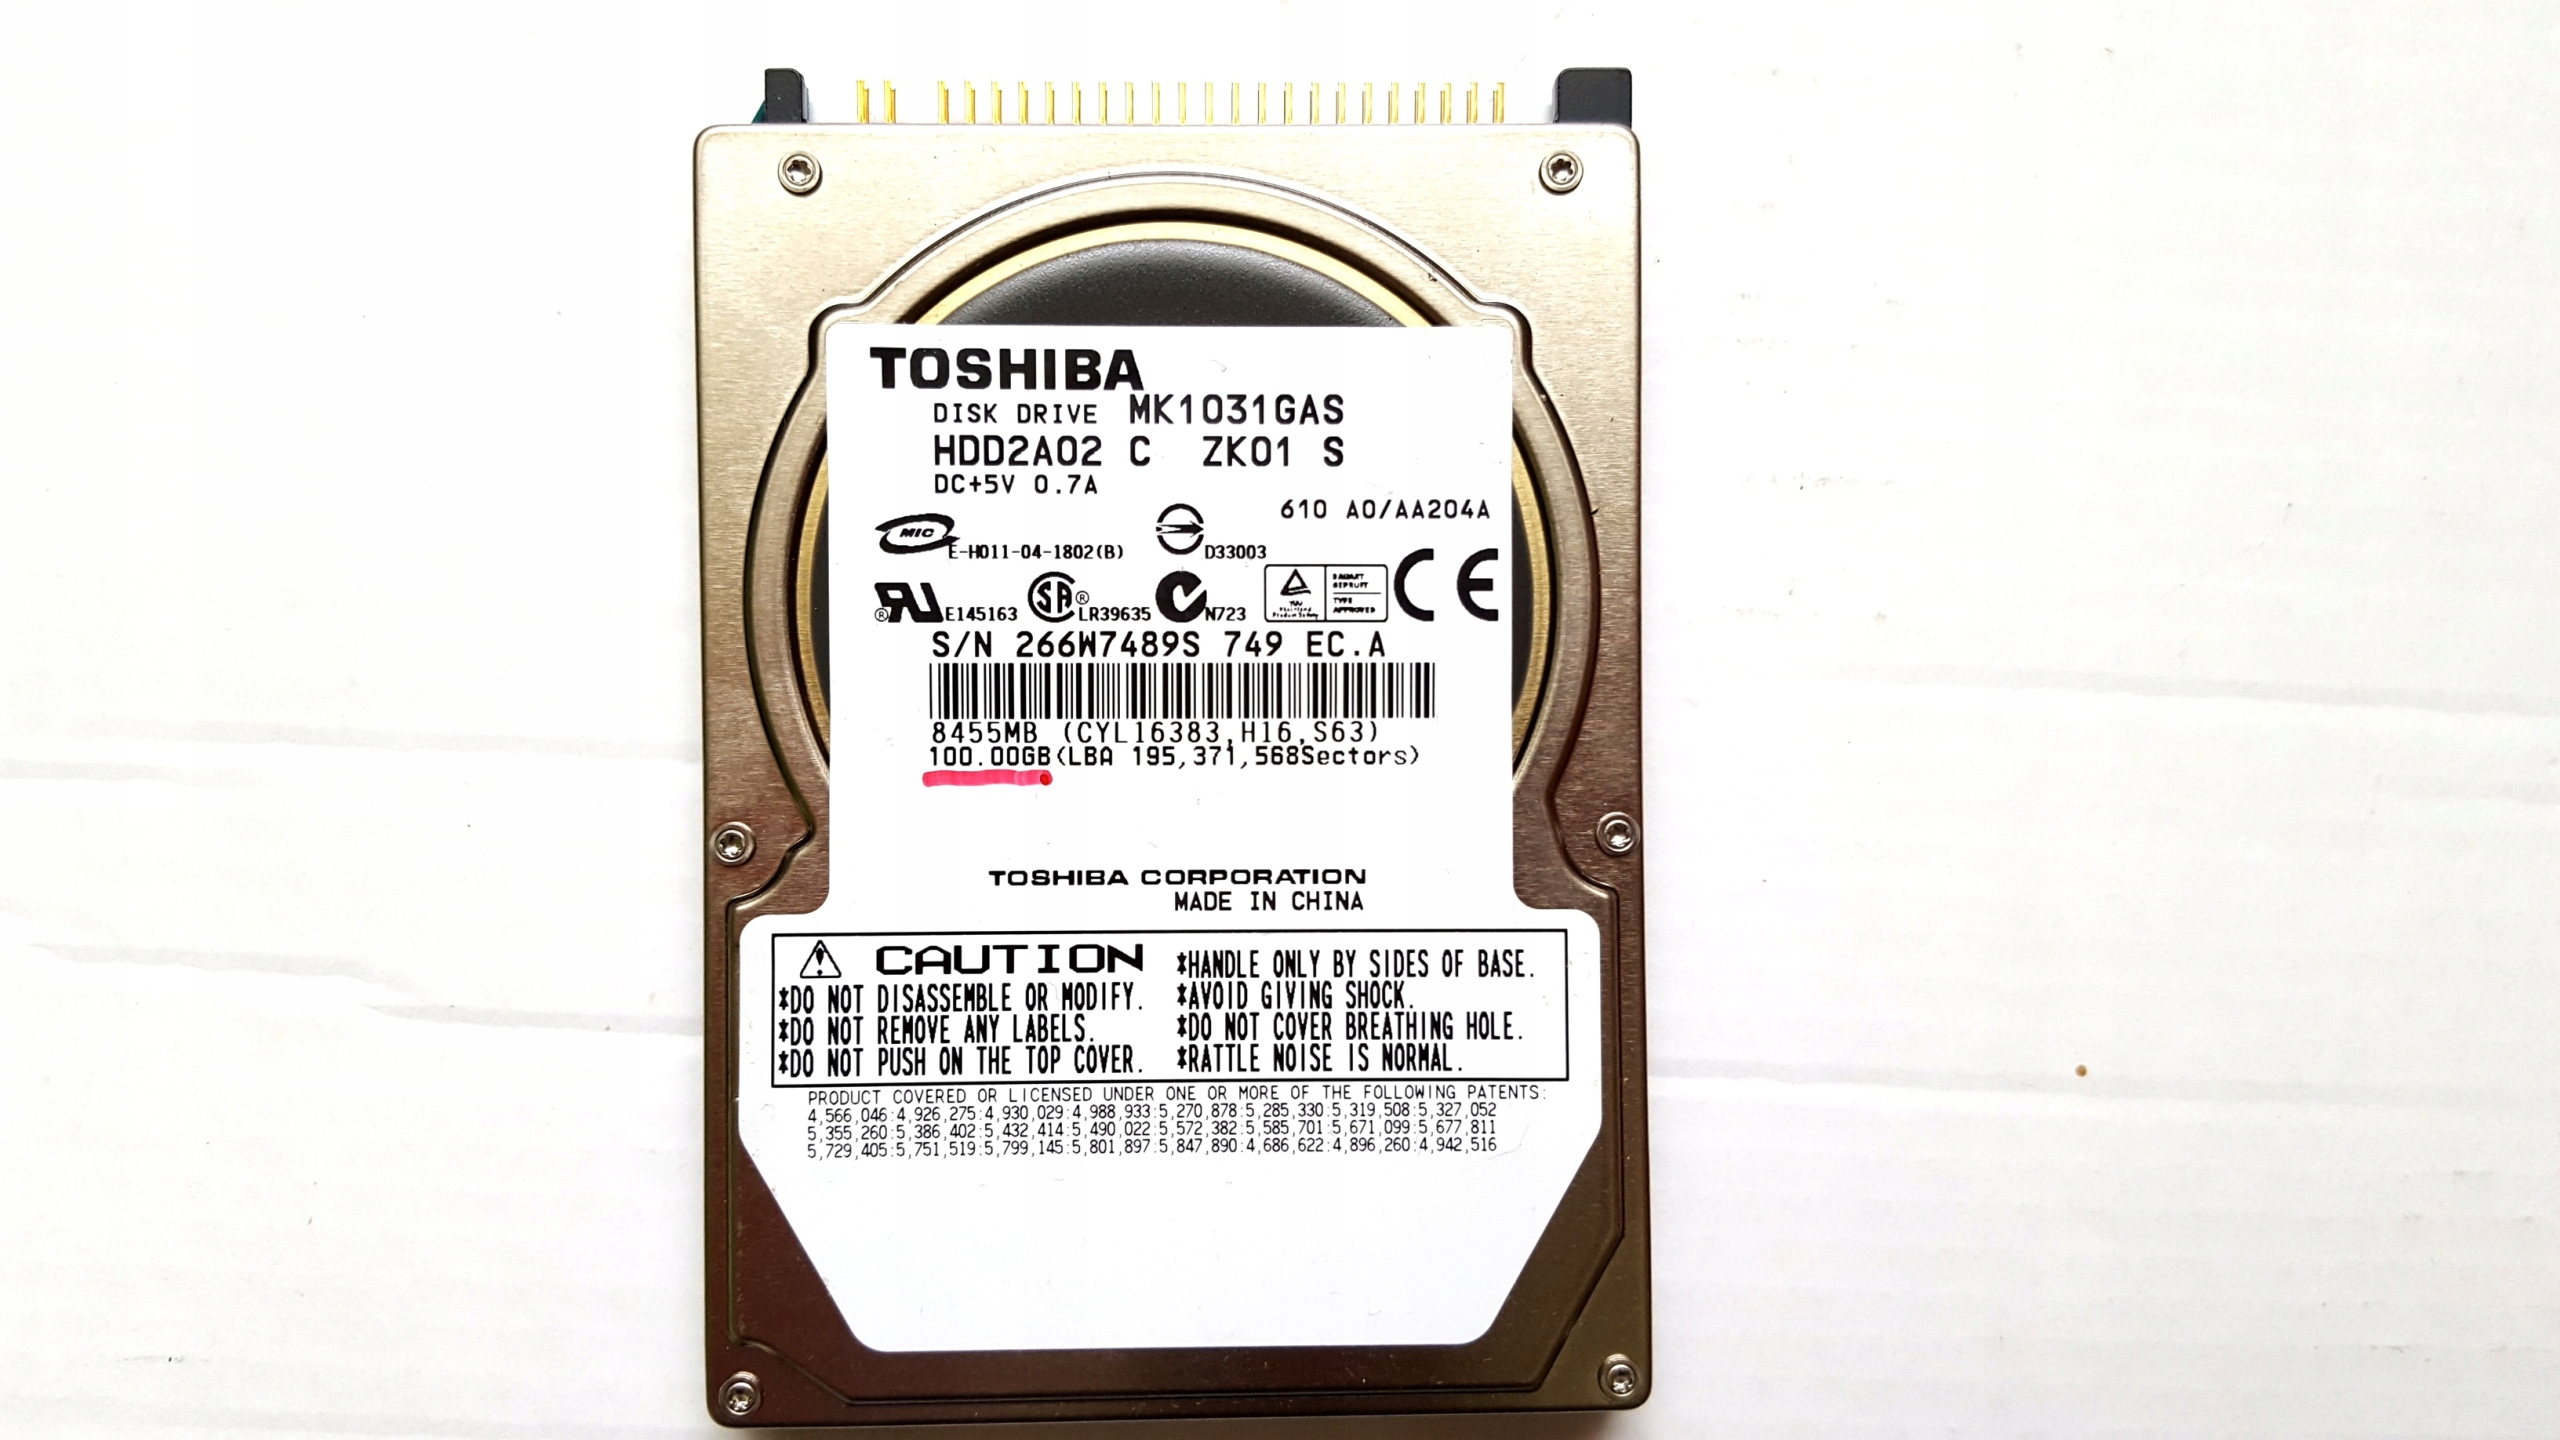 "DYSK TWARDY 2.5"" TOSHIBA 100GB ATA do Laptopa"